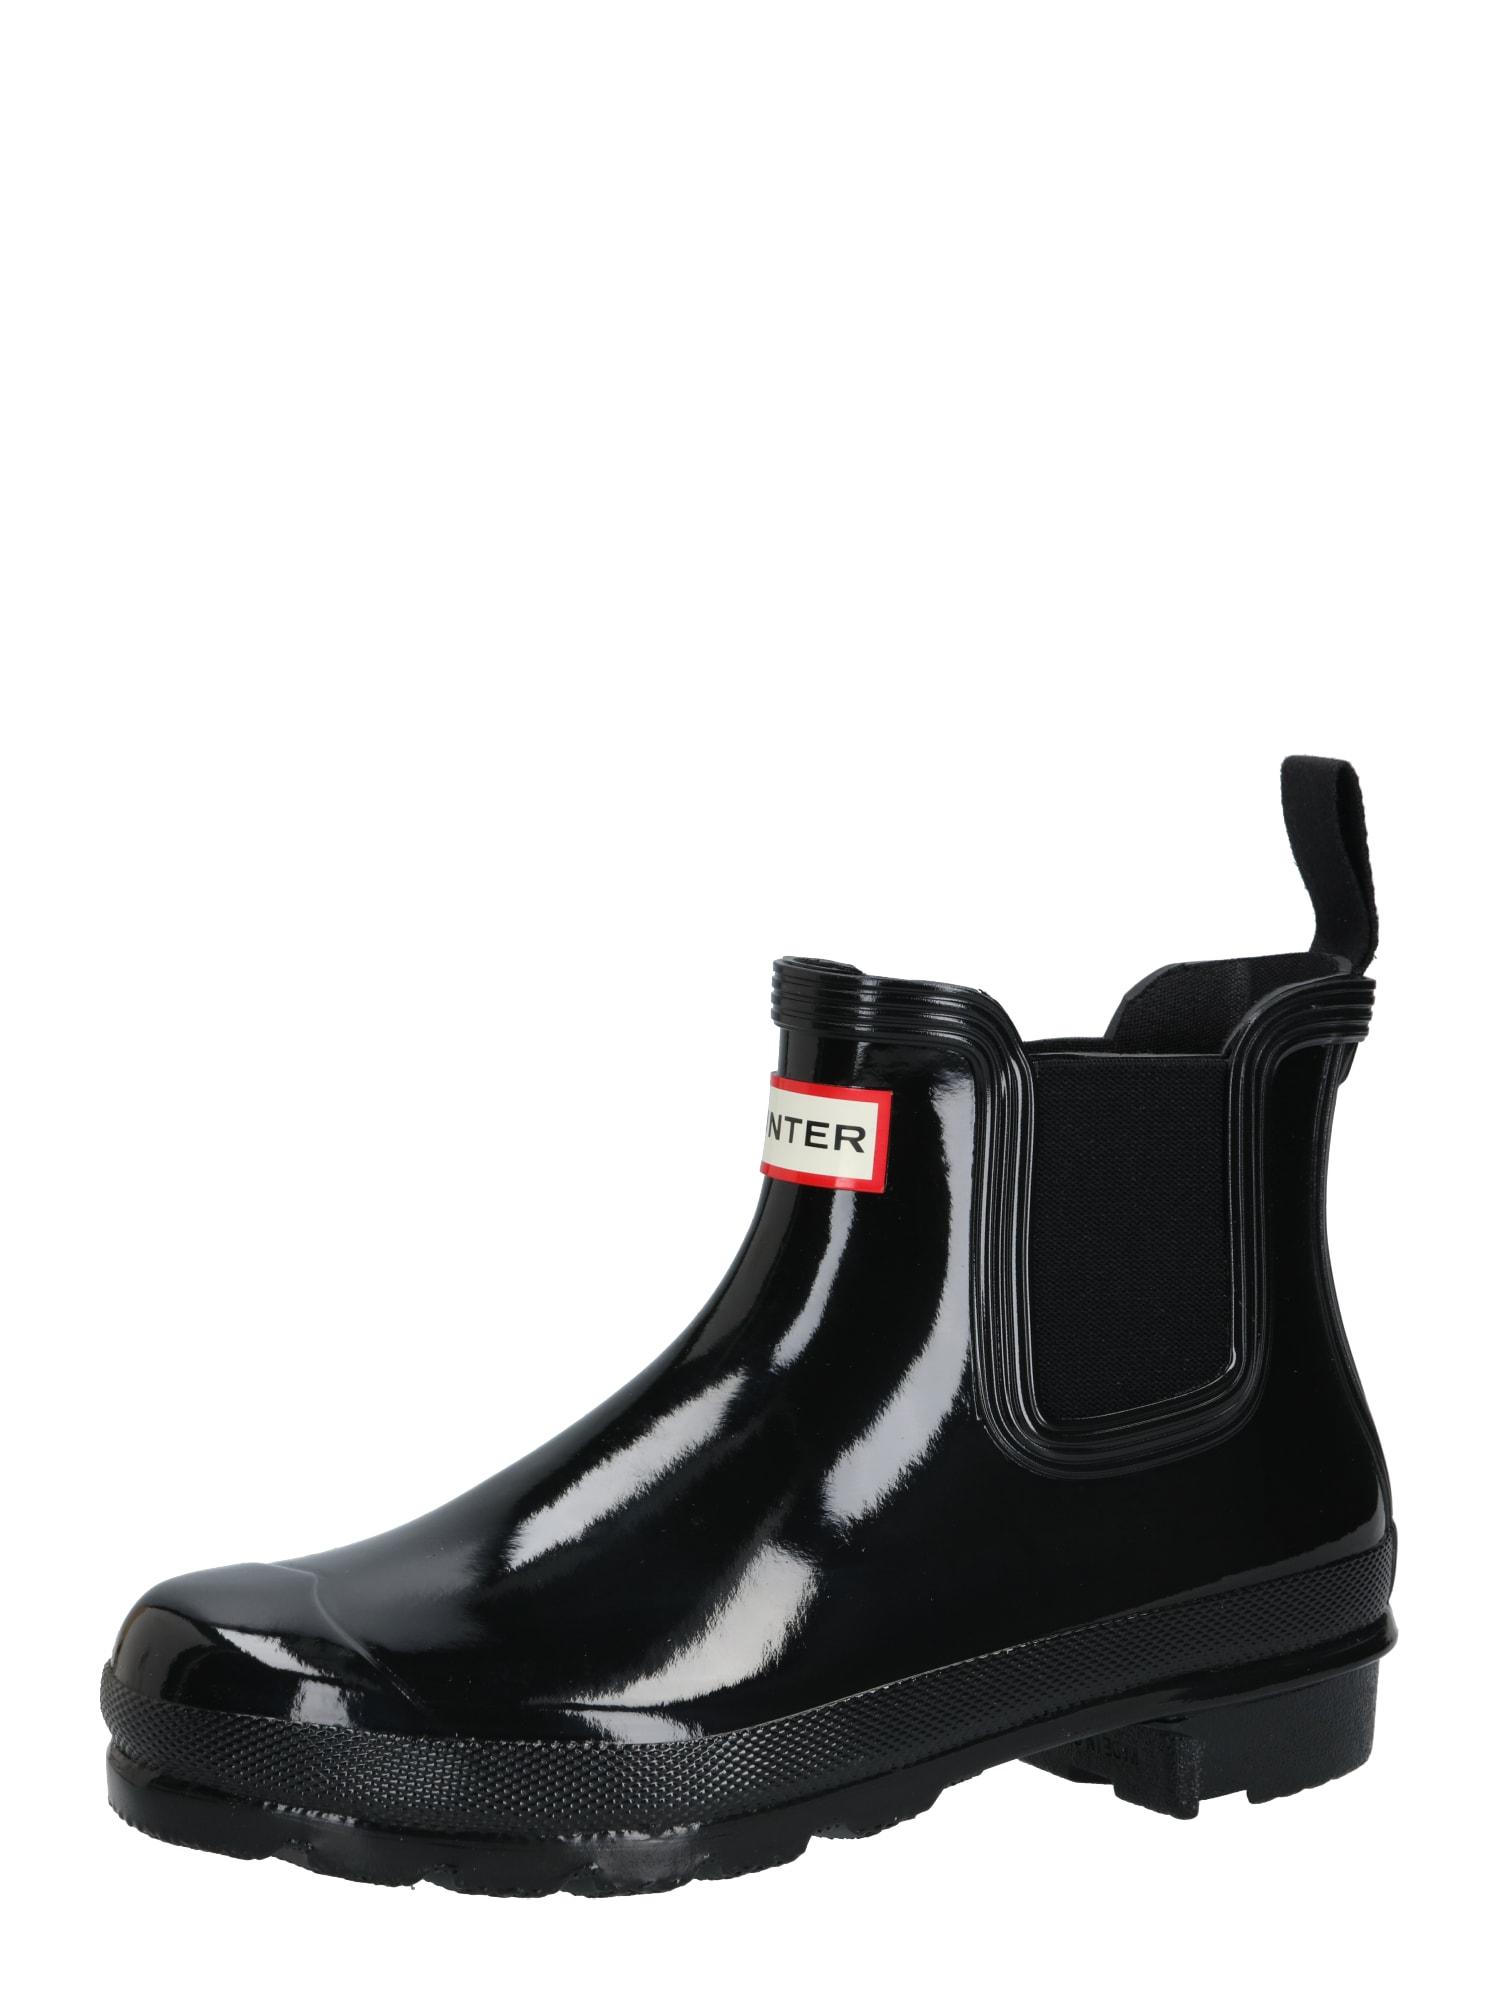 HUNTER Guminiai batai juoda / balta / raudona